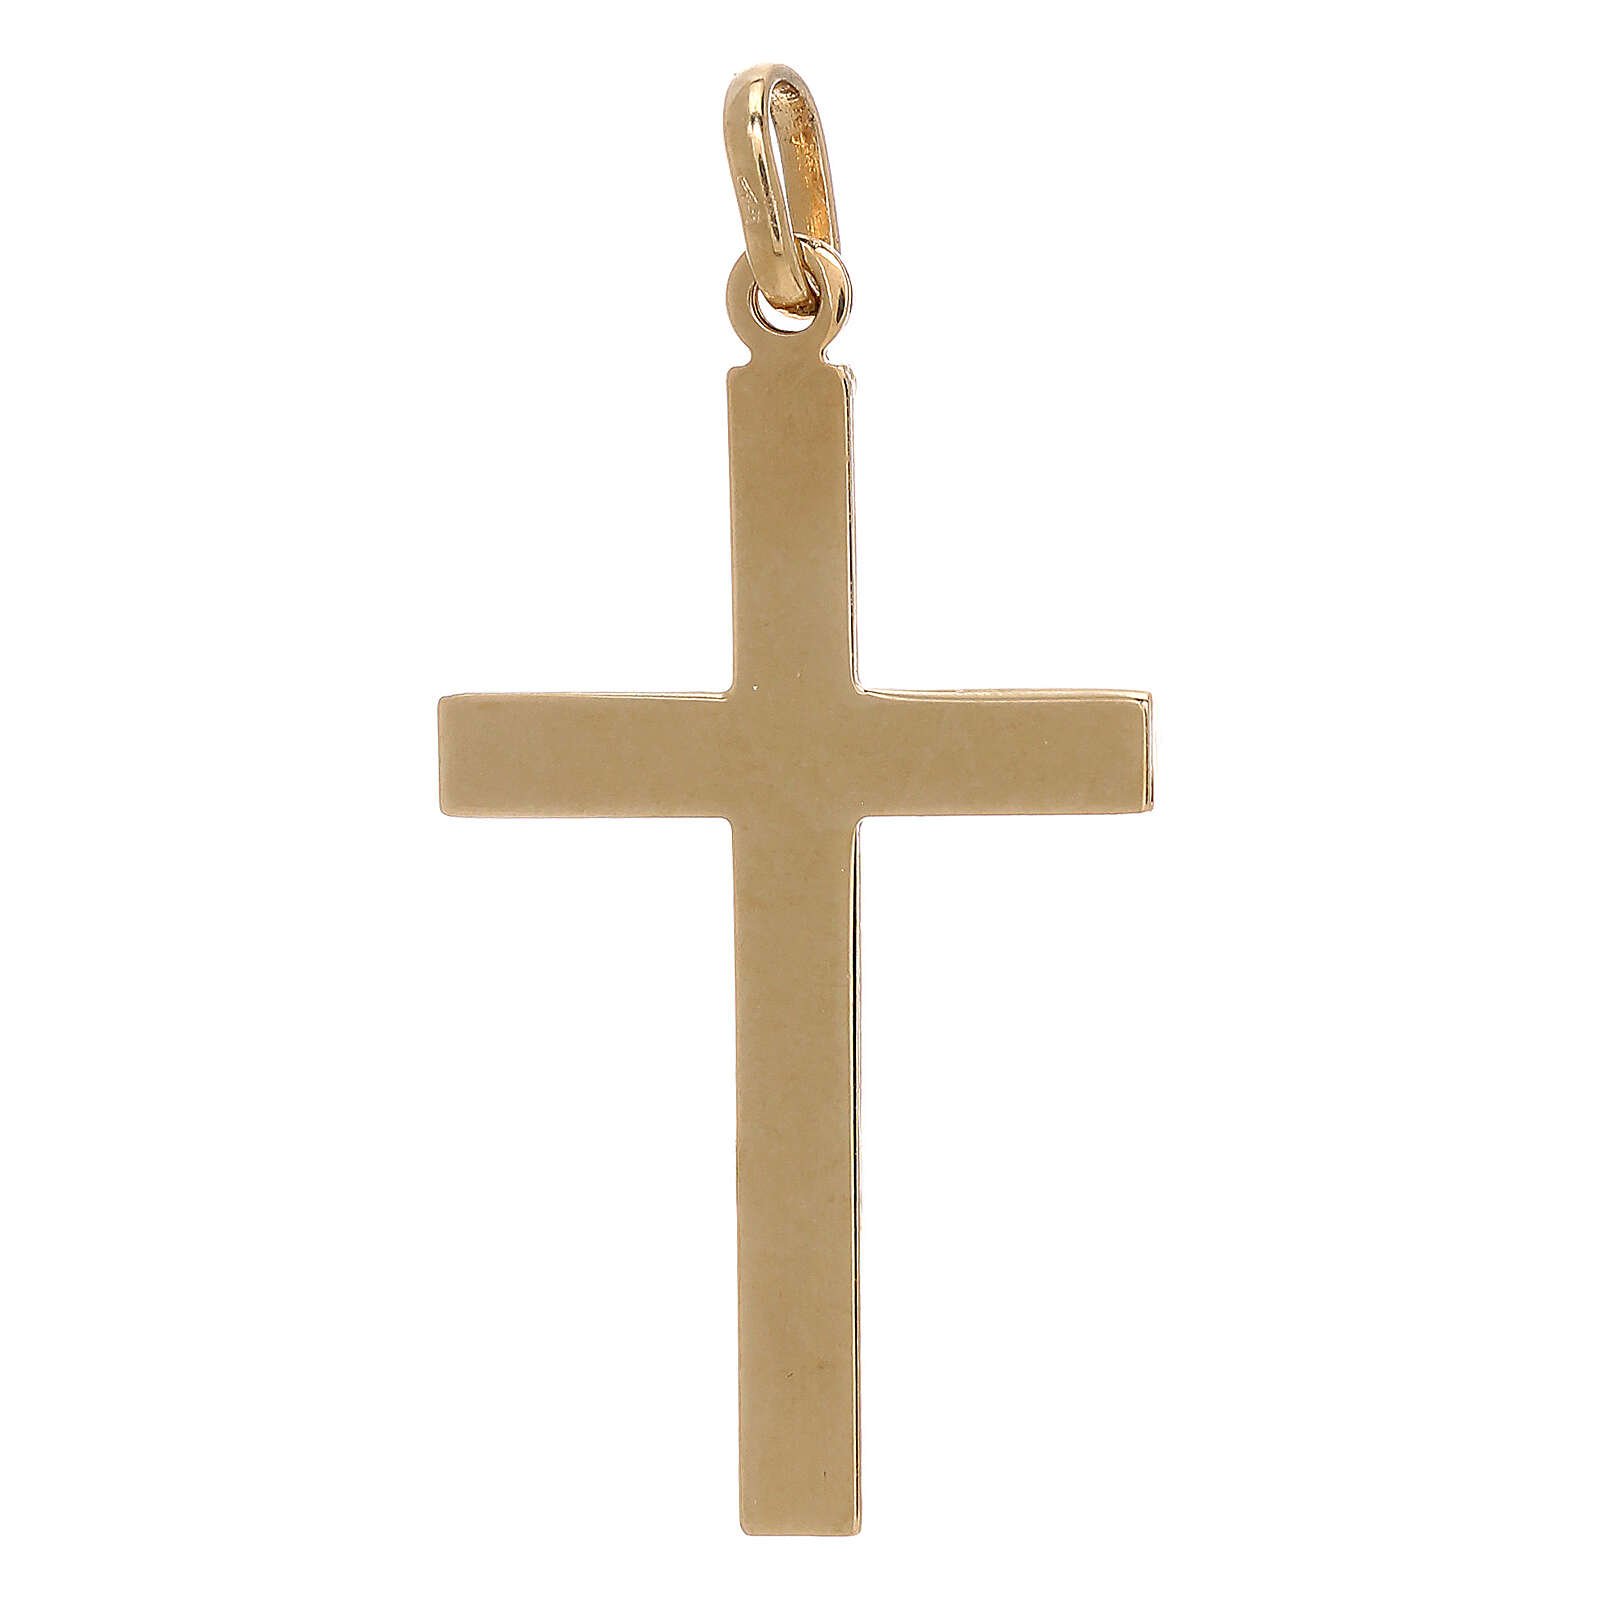 Colgante cruz detalle red oro bicolor 18 quilates 1,15 gr 4